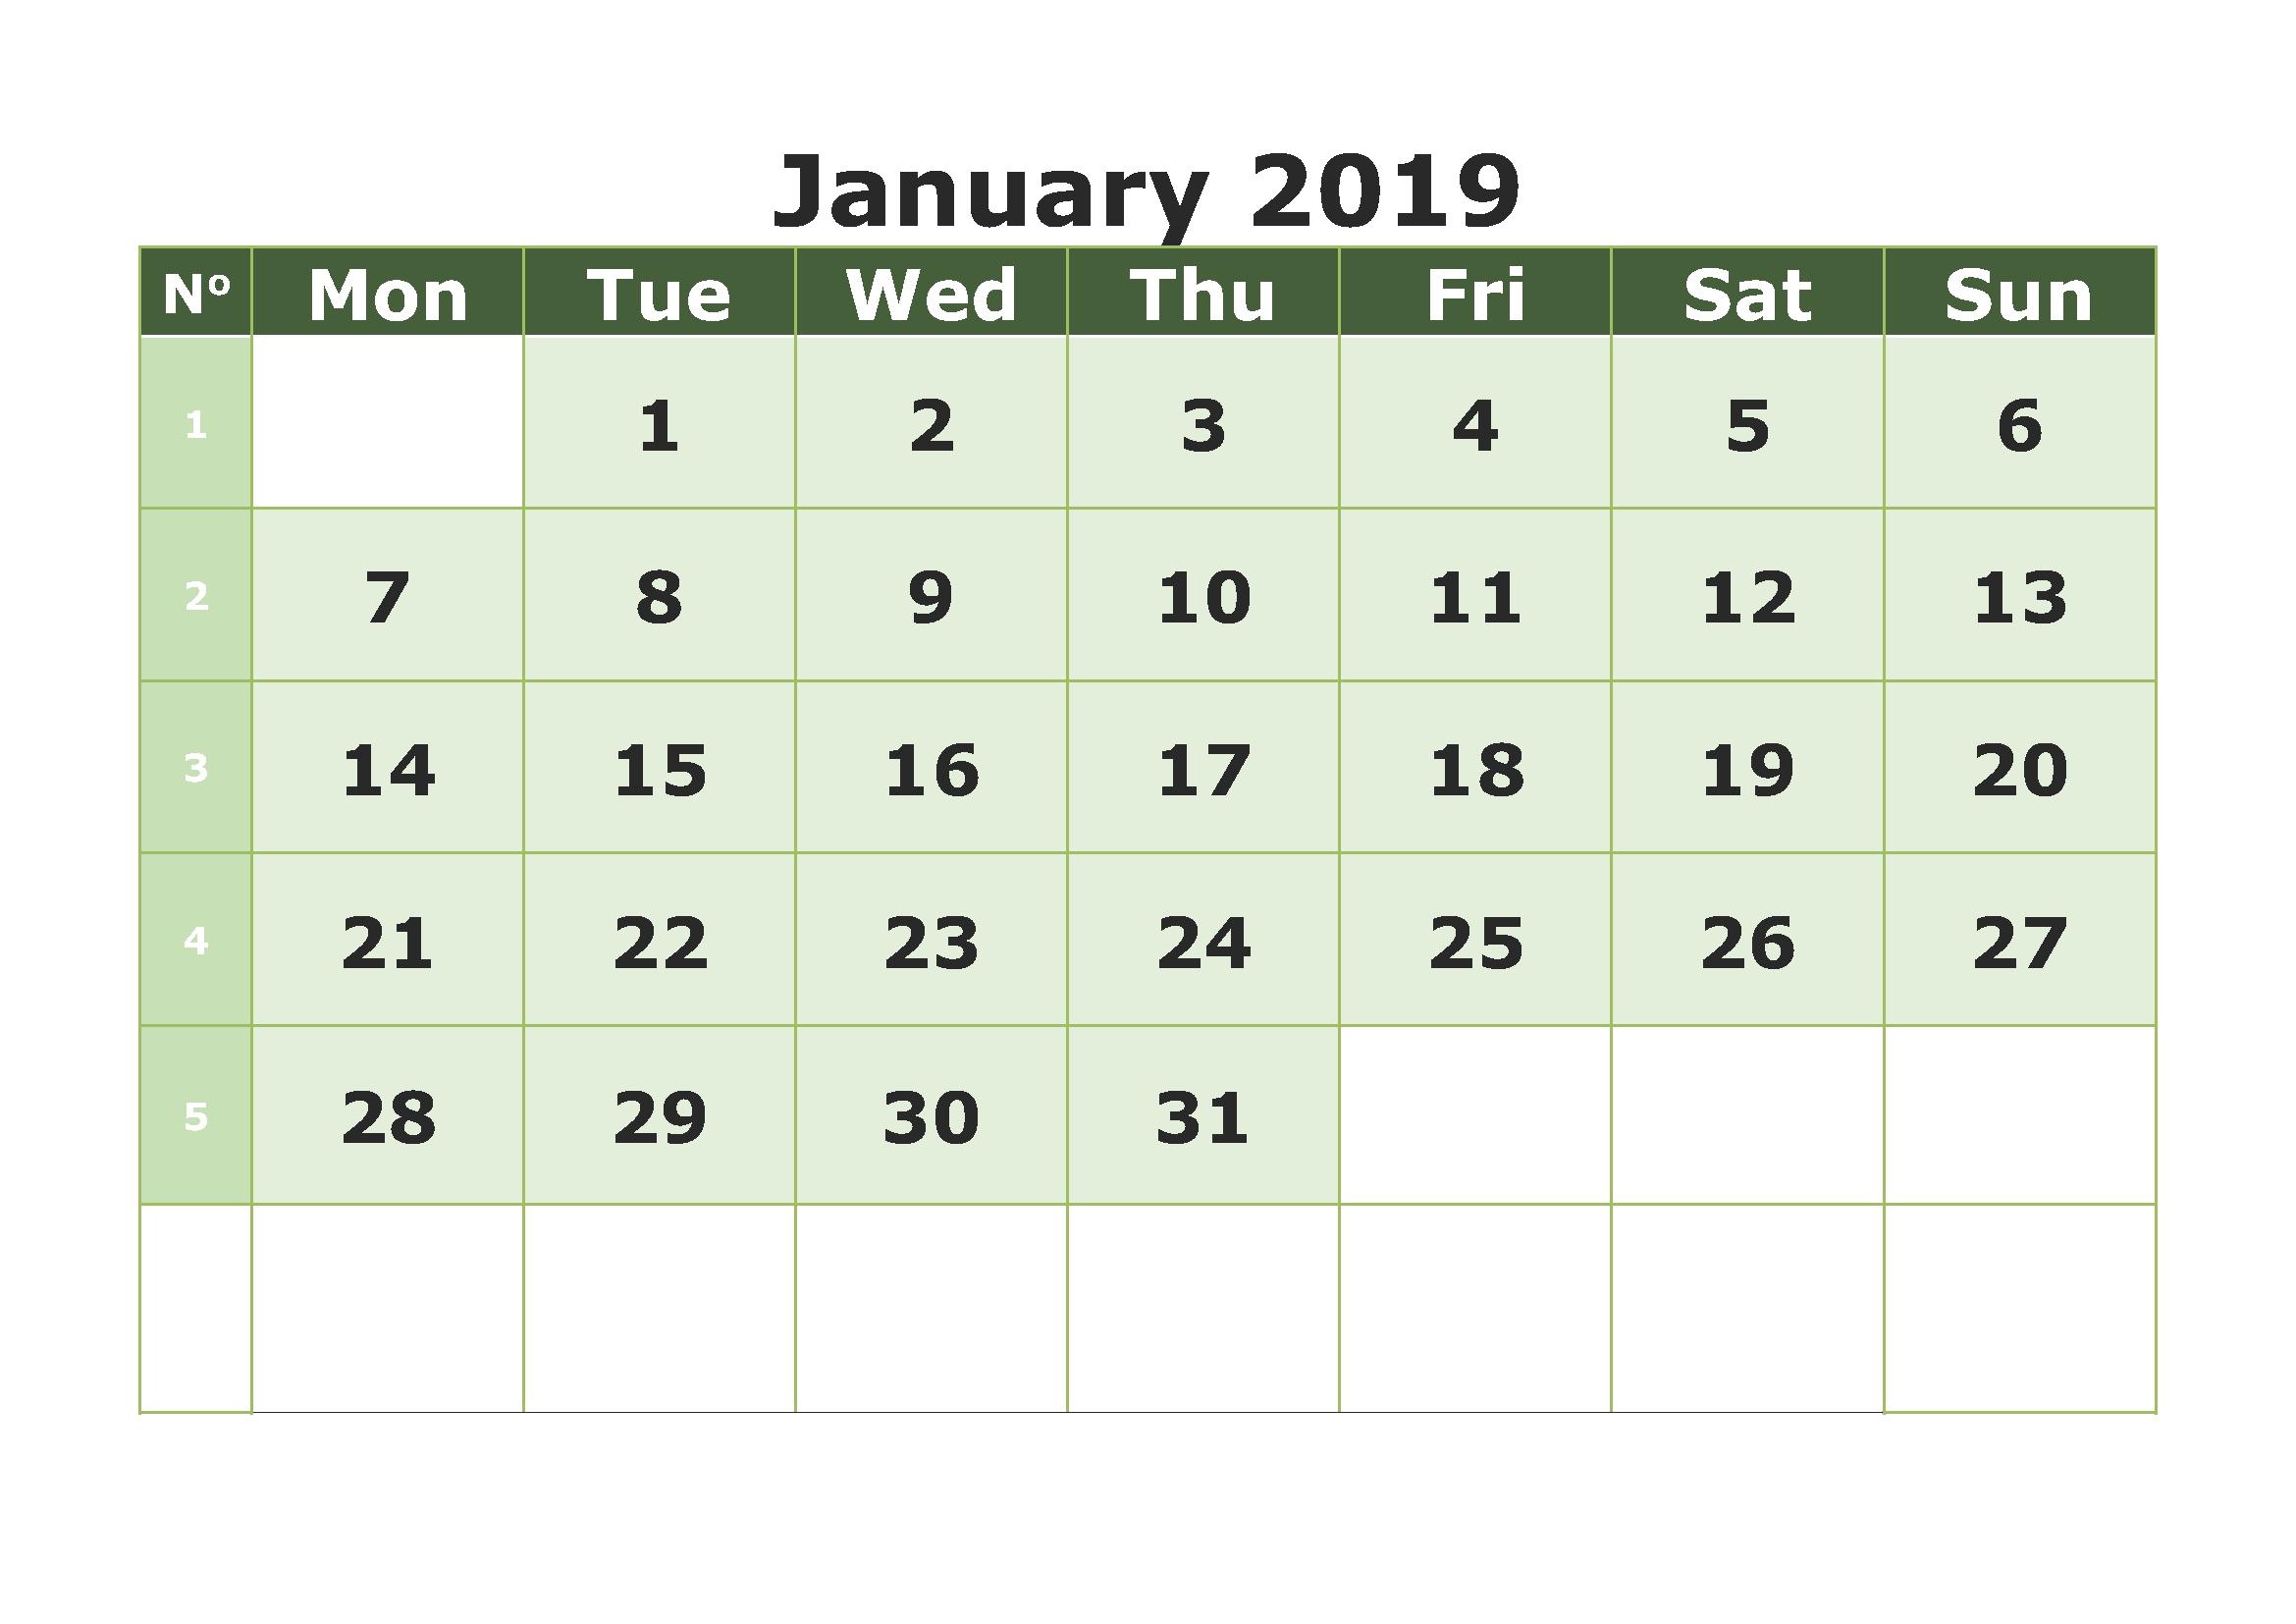 january 2019 calendar download january calendar january 2019::January 2019 Calendar USA